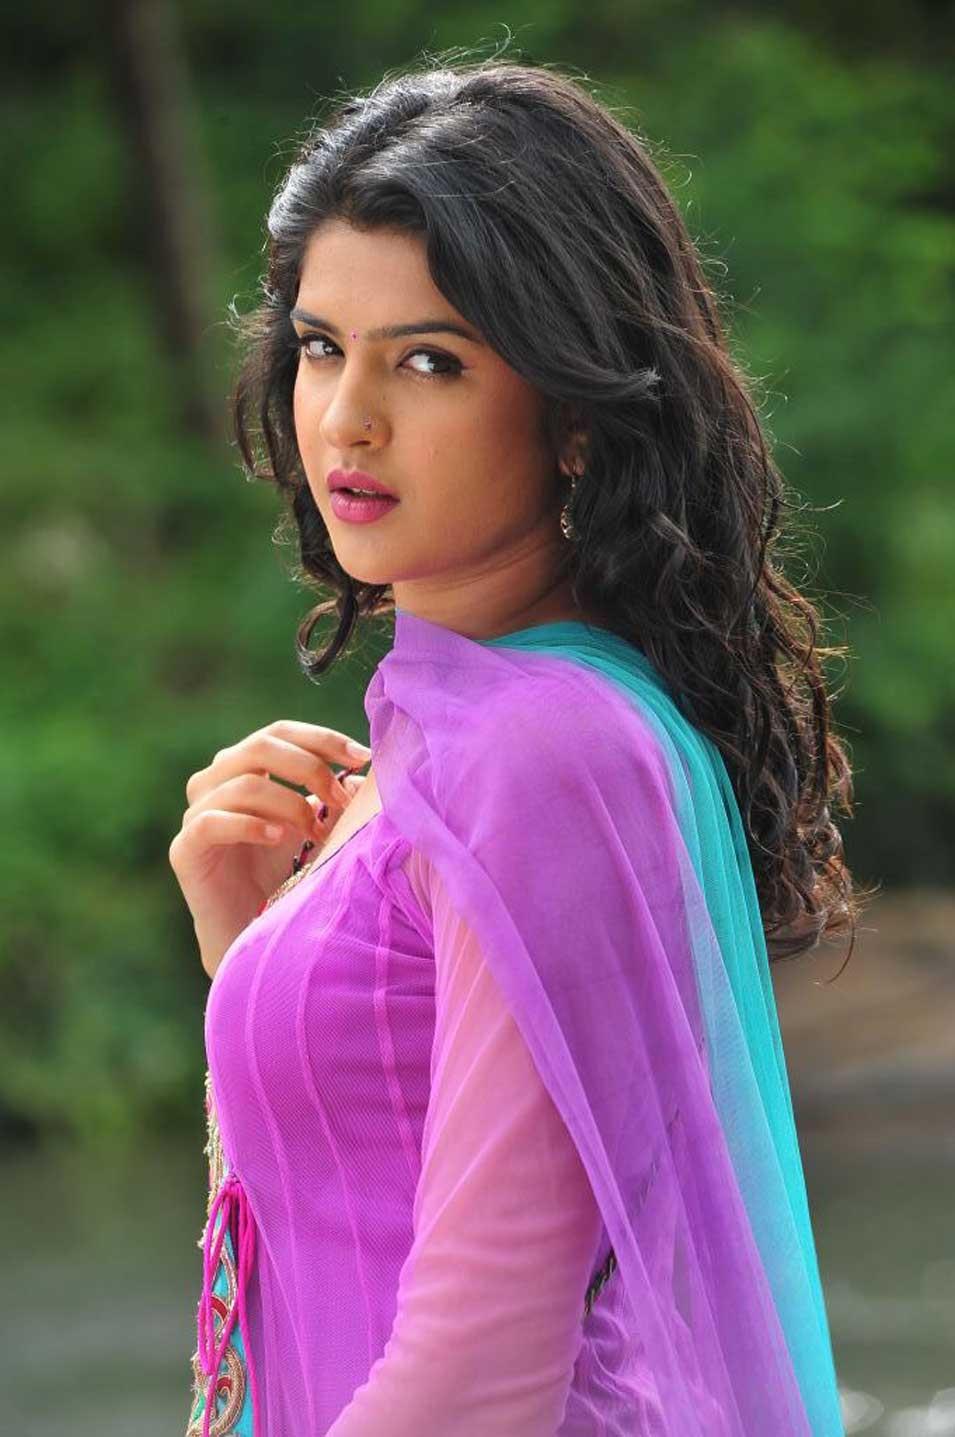 Cute Baby Stylish Wallpaper Actress Stills Deeksha Seth New Stills